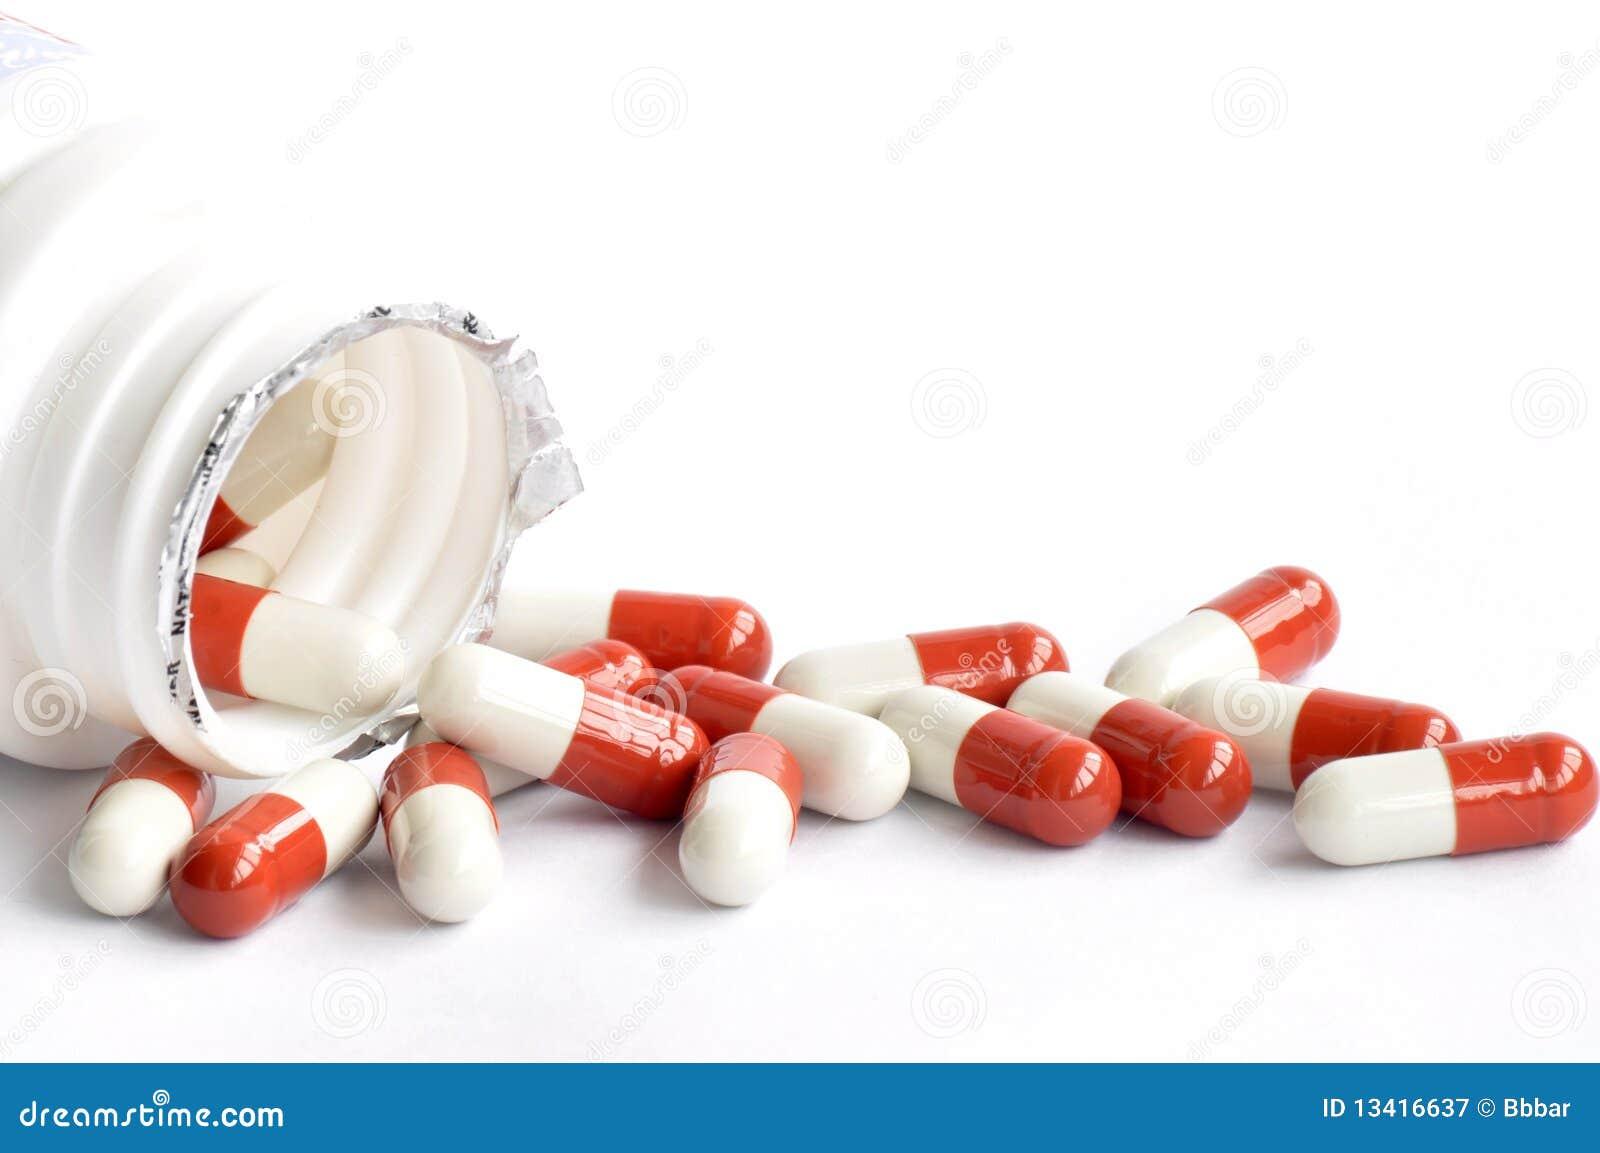 Medicine capsules stock image. Image of medicine, aspirin ...